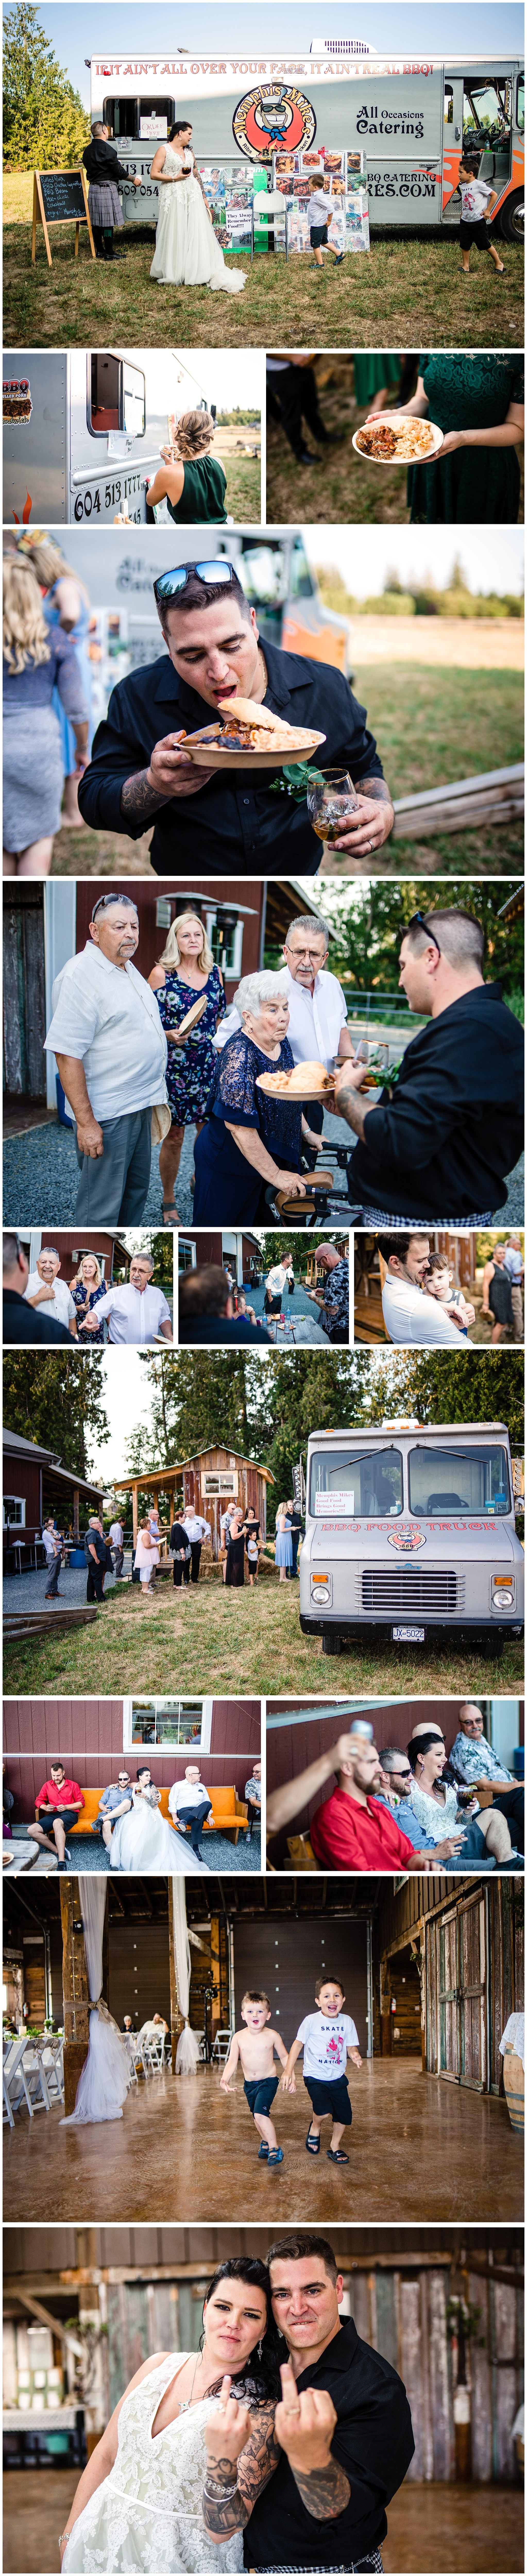 White-Owl-Barn-langley-bc-wedding-photographer-rustic-bbq-foodtruck-scottish-emerald-green-drinks_0008.jpg